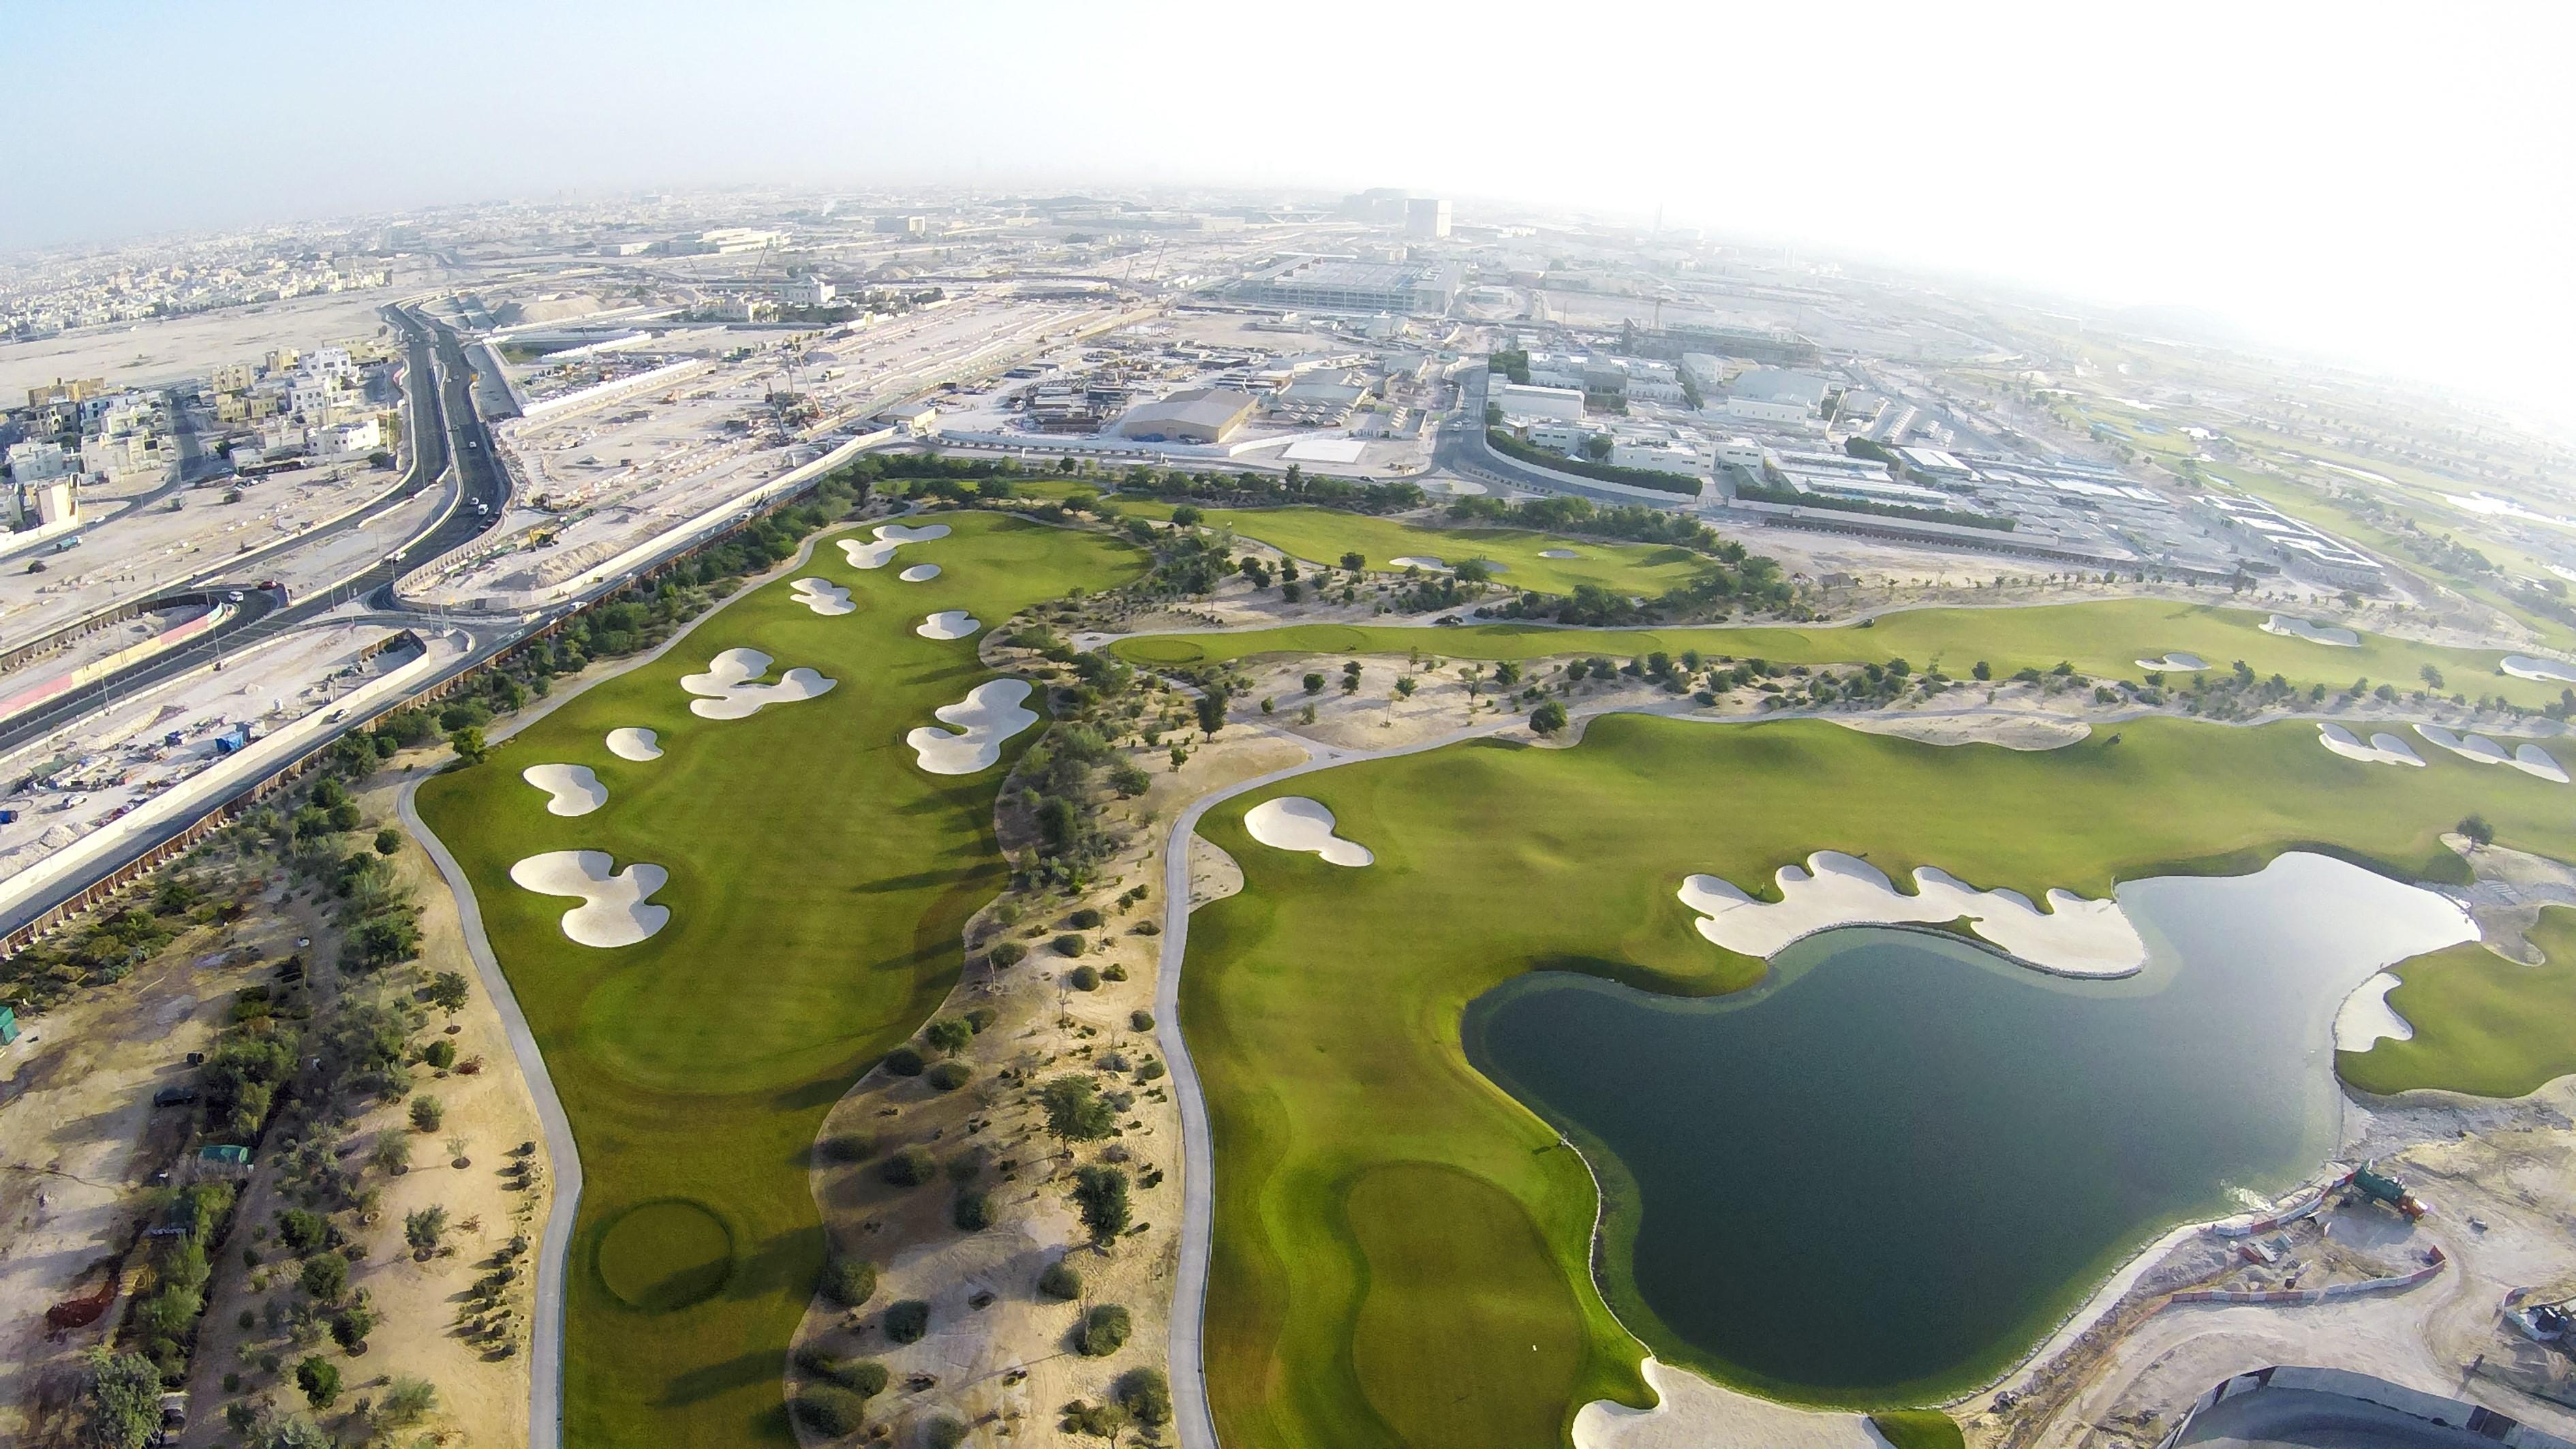 Drone View of Holes 13 14 15 16 at Qatar International Golf Club